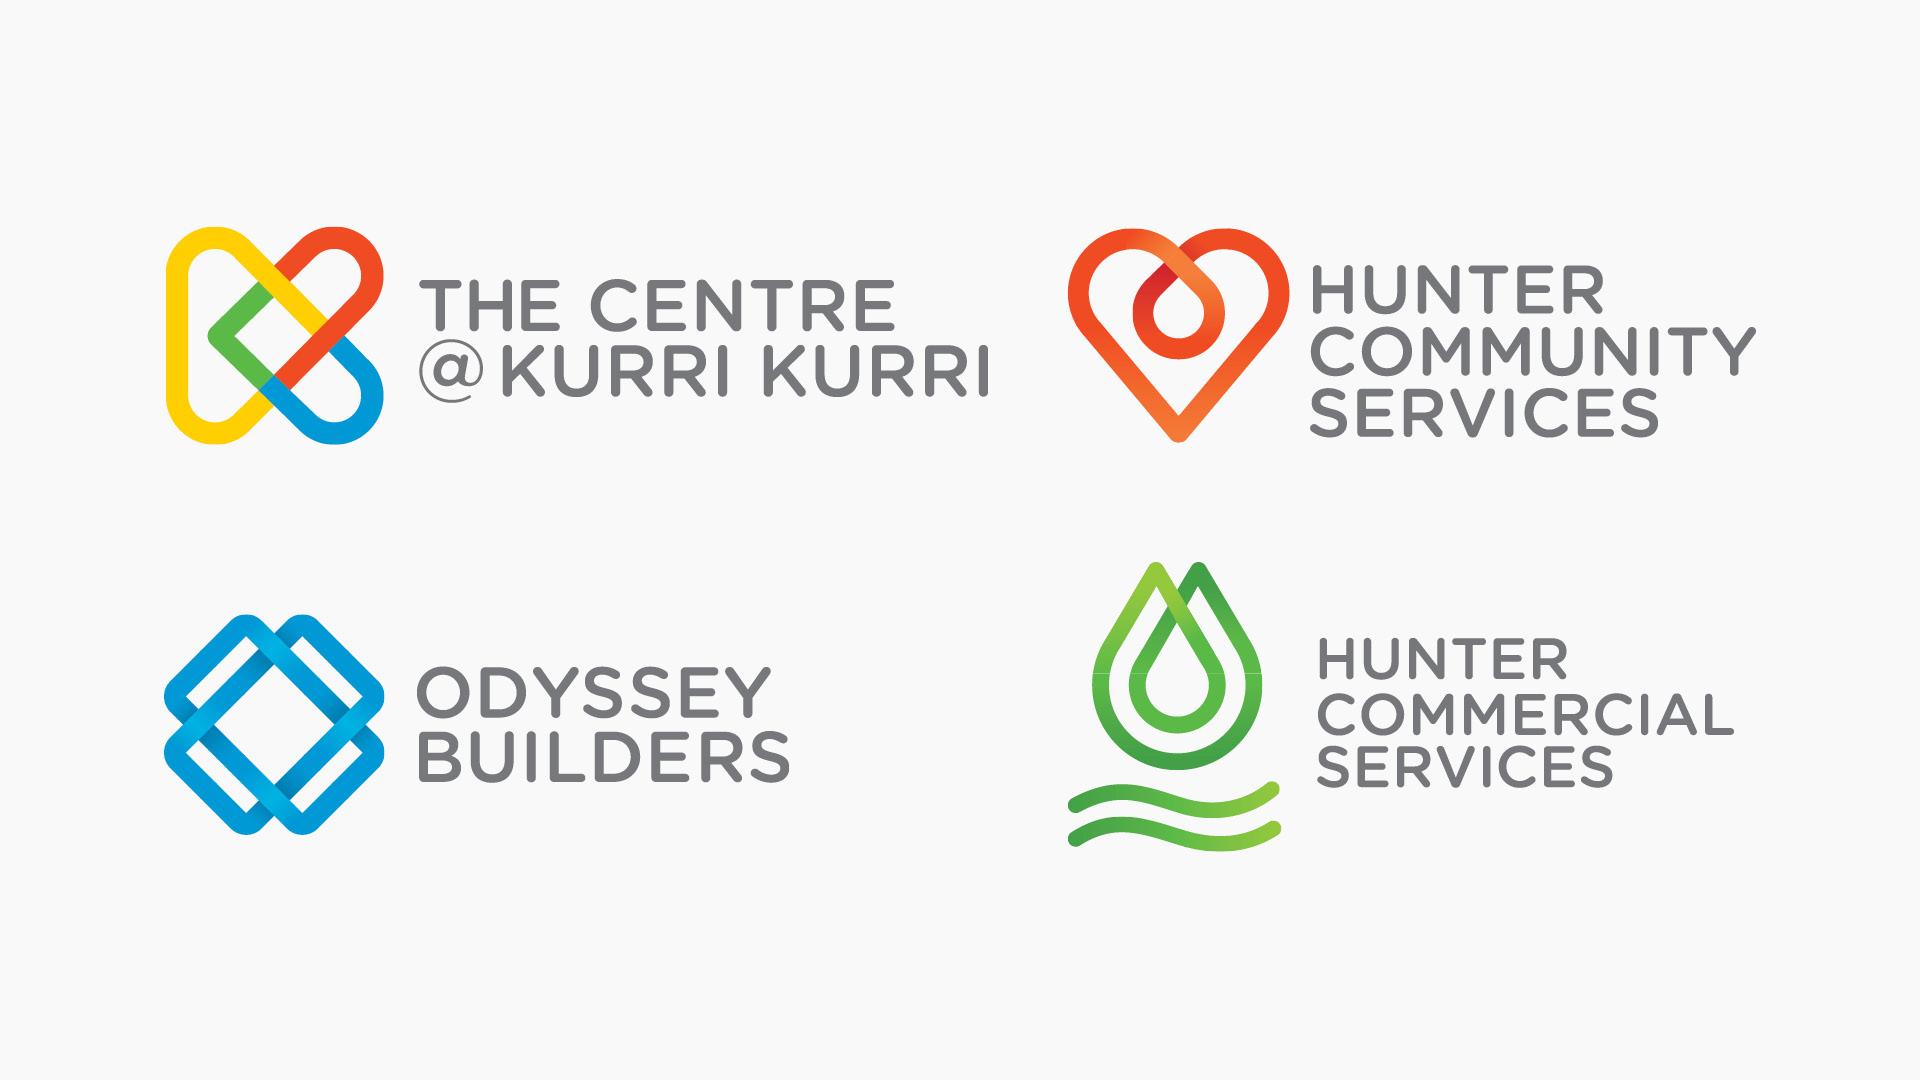 New logos for Kurri Kurri Community Services units